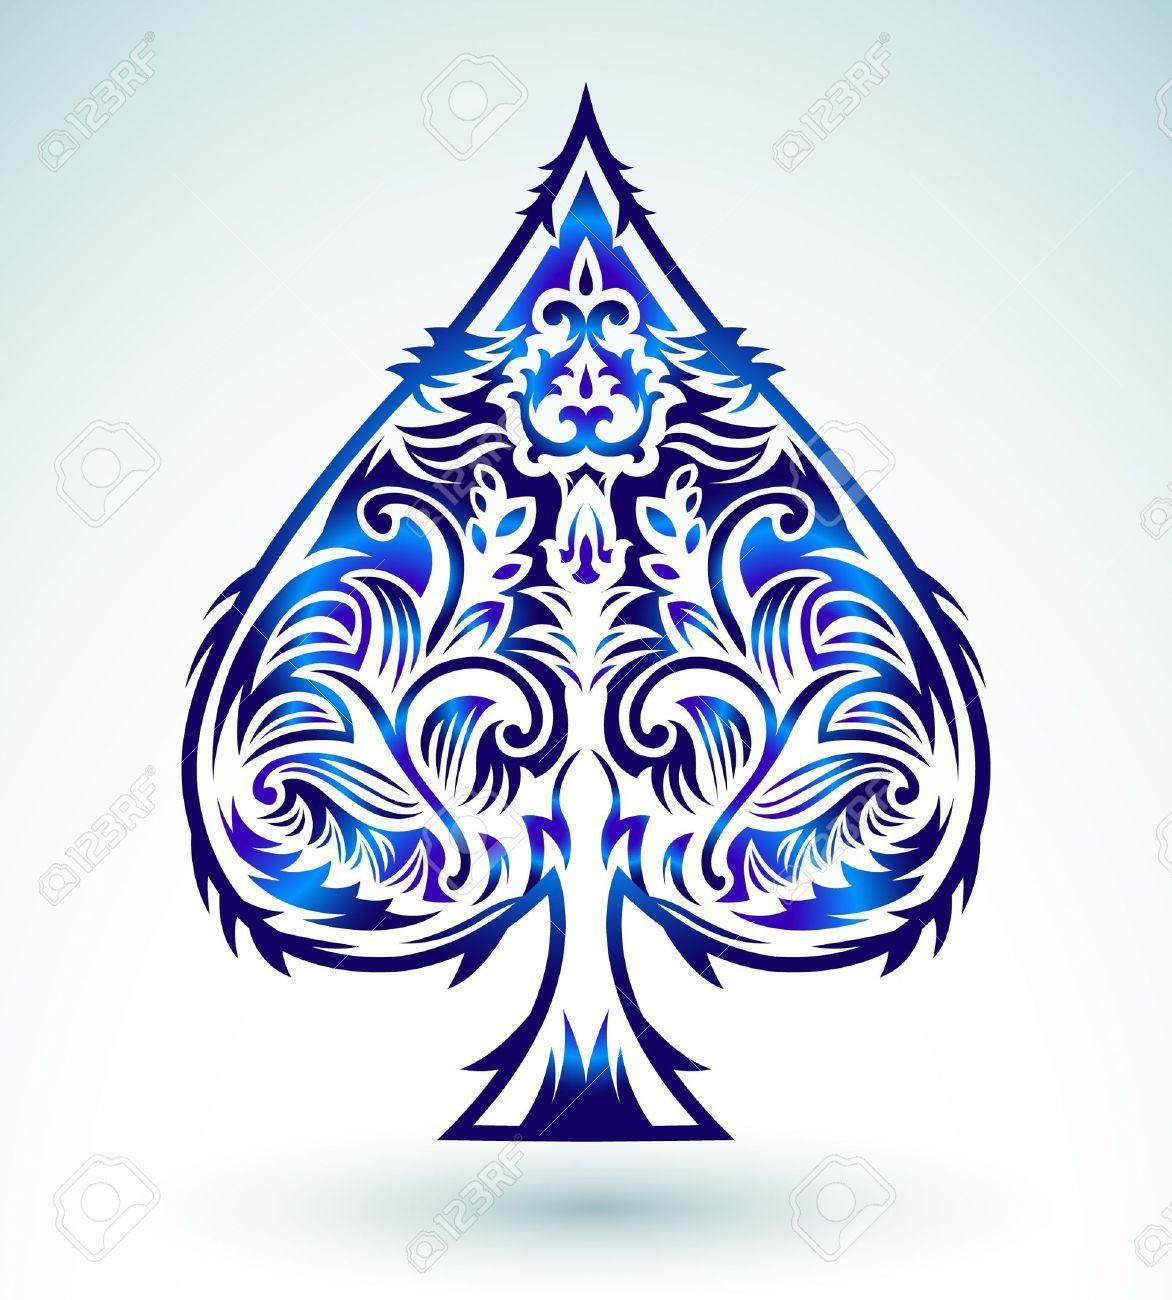 21010845 design di stile tribale vanga asso carte da gioco da poker tribal style design spade ace poker playing cards illustration by julioaldana via dreamstime biocorpaavc Choice Image